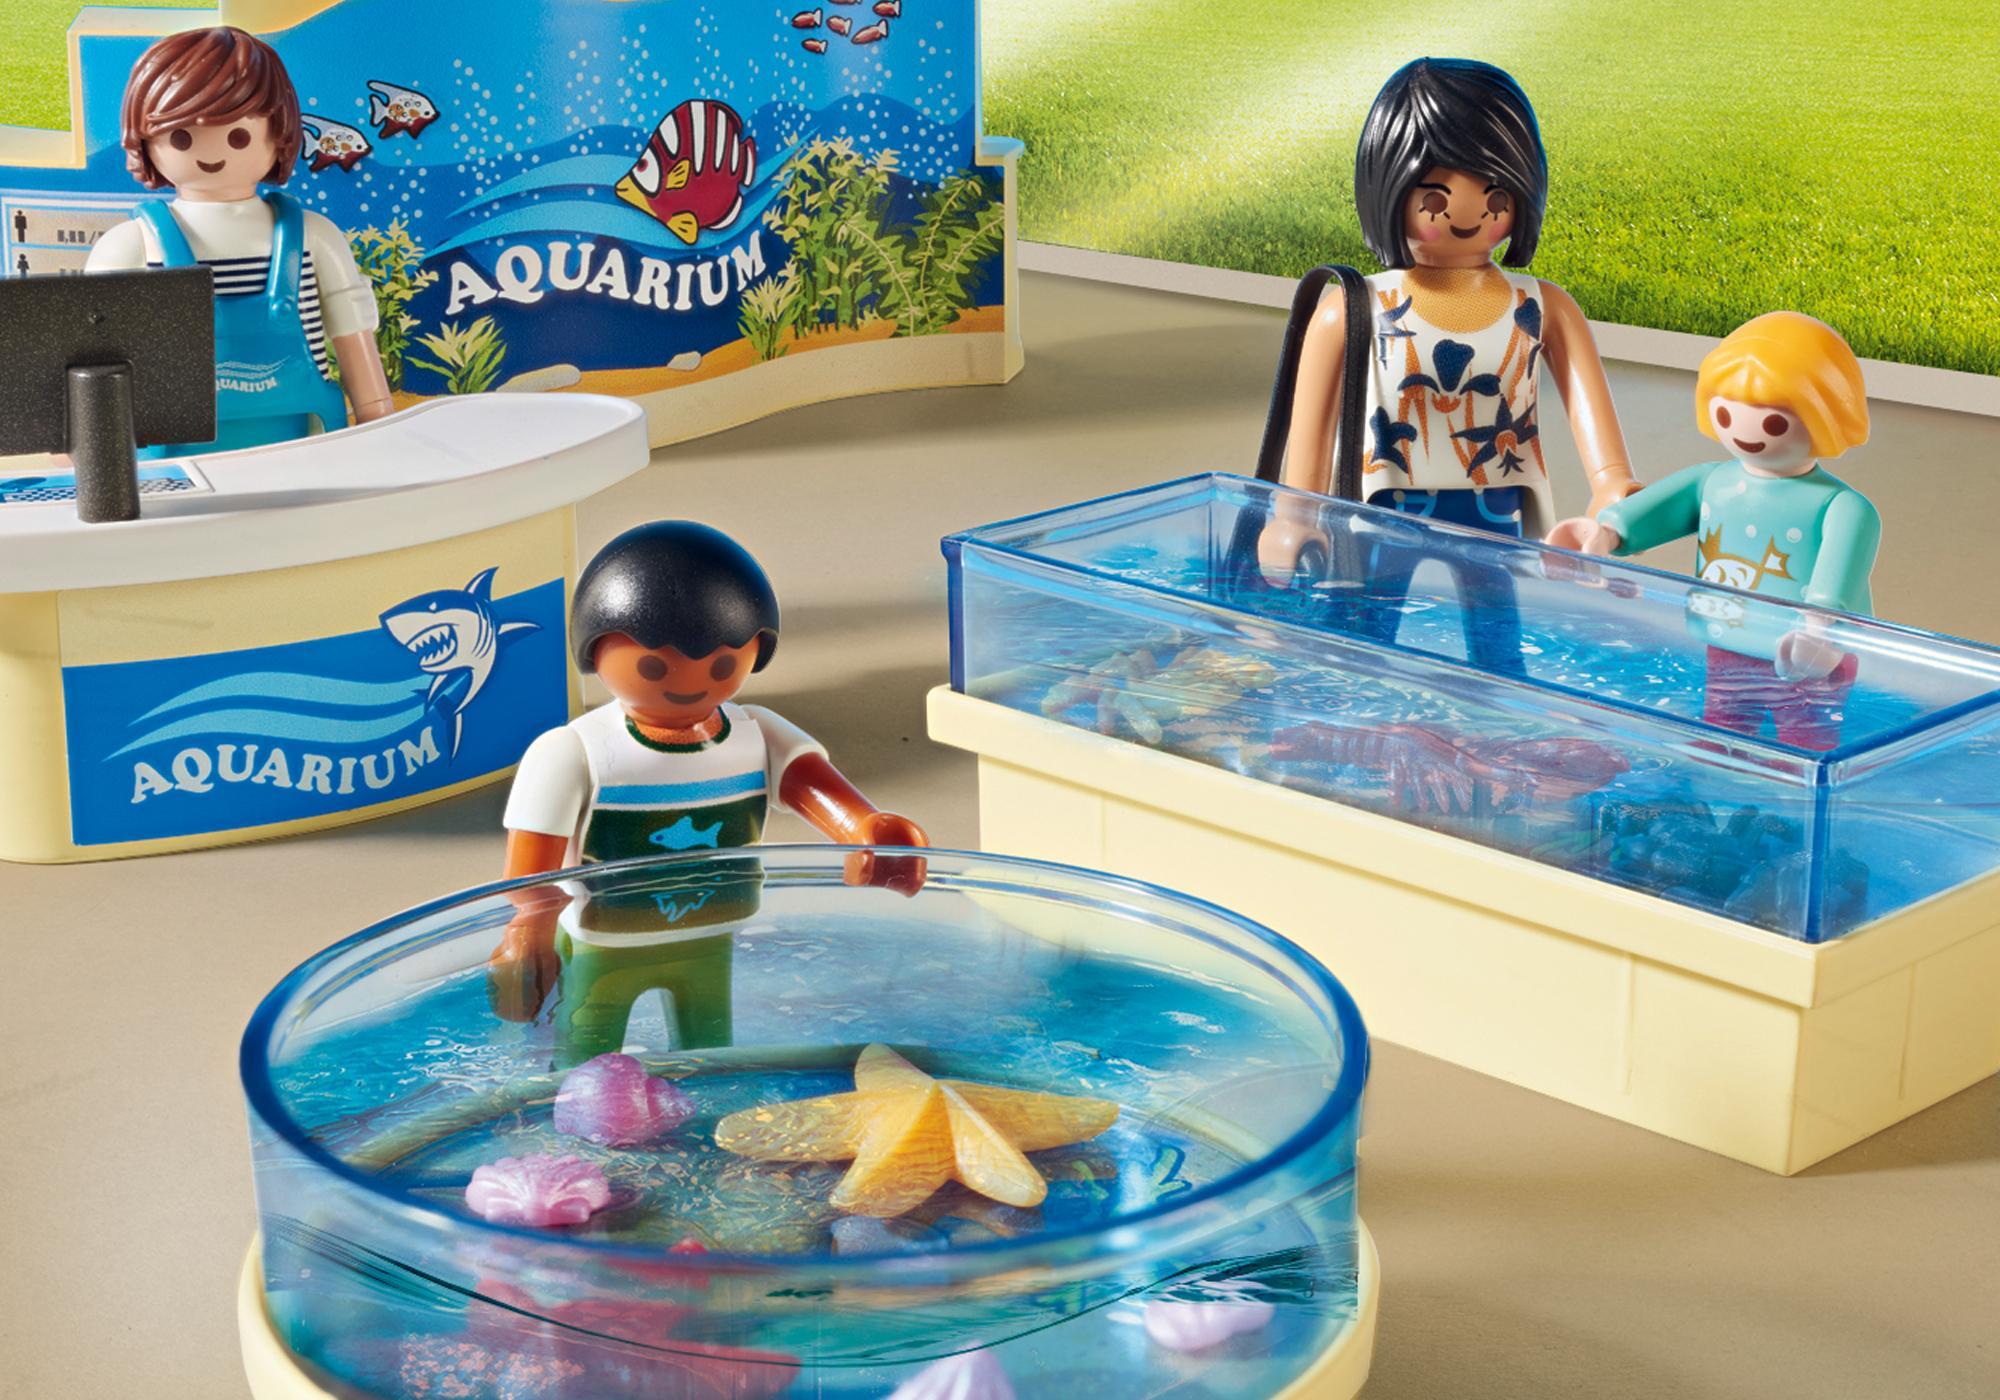 http://media.playmobil.com/i/playmobil/9061_product_extra2/Aquarium Shop